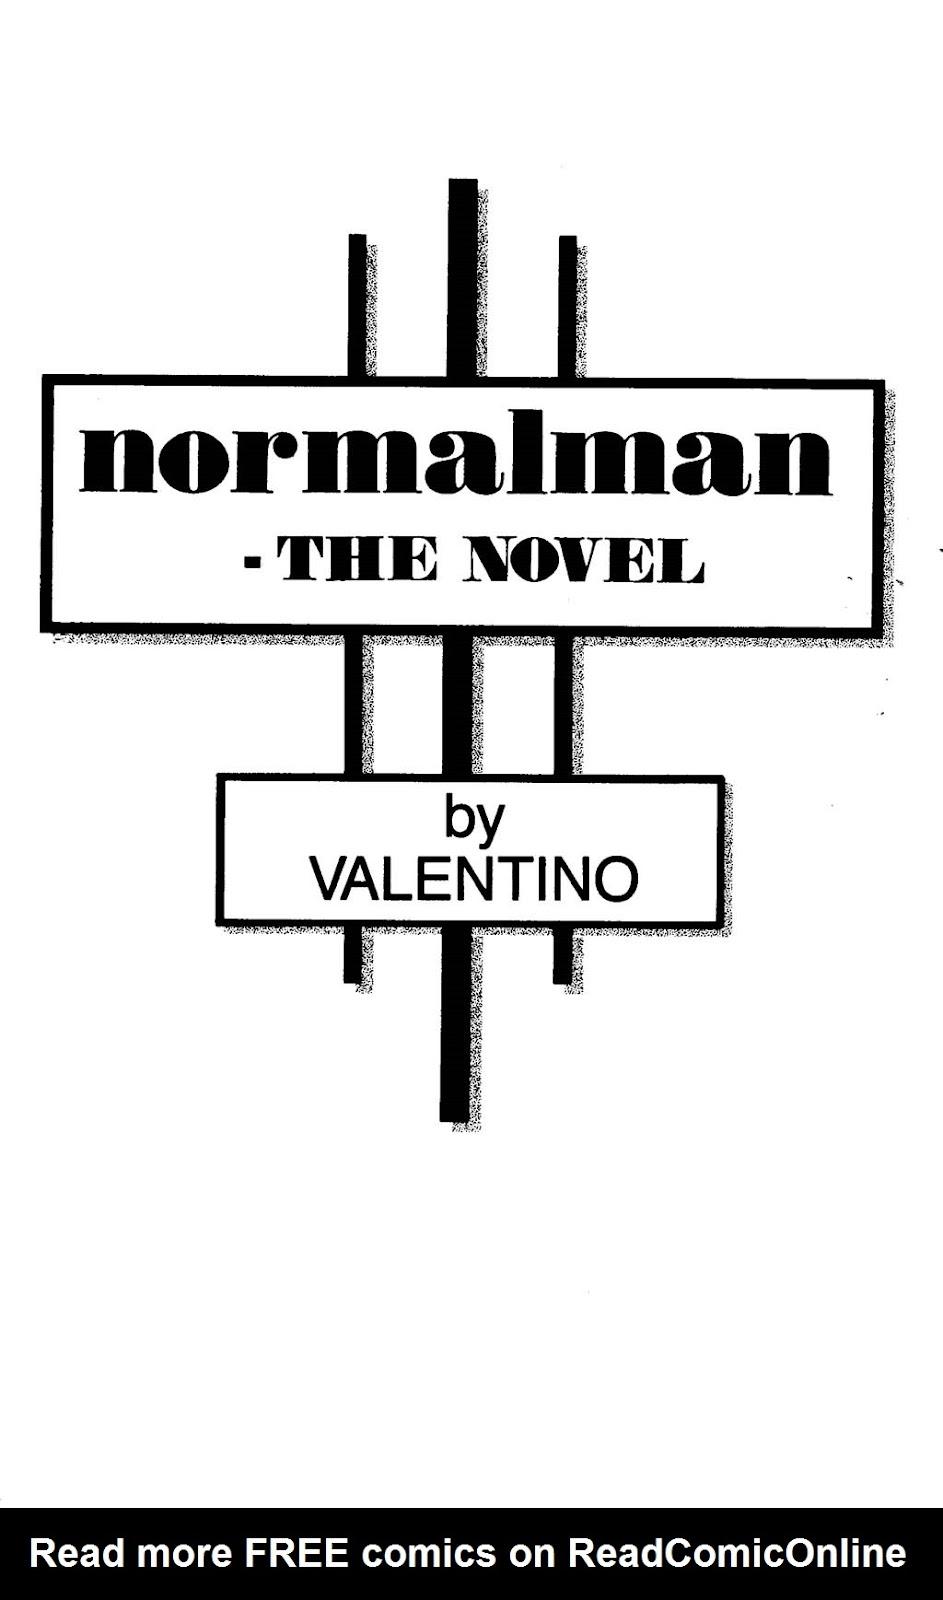 Read online Normalman - The Novel comic -  Issue # TPB (Part 1) - 4